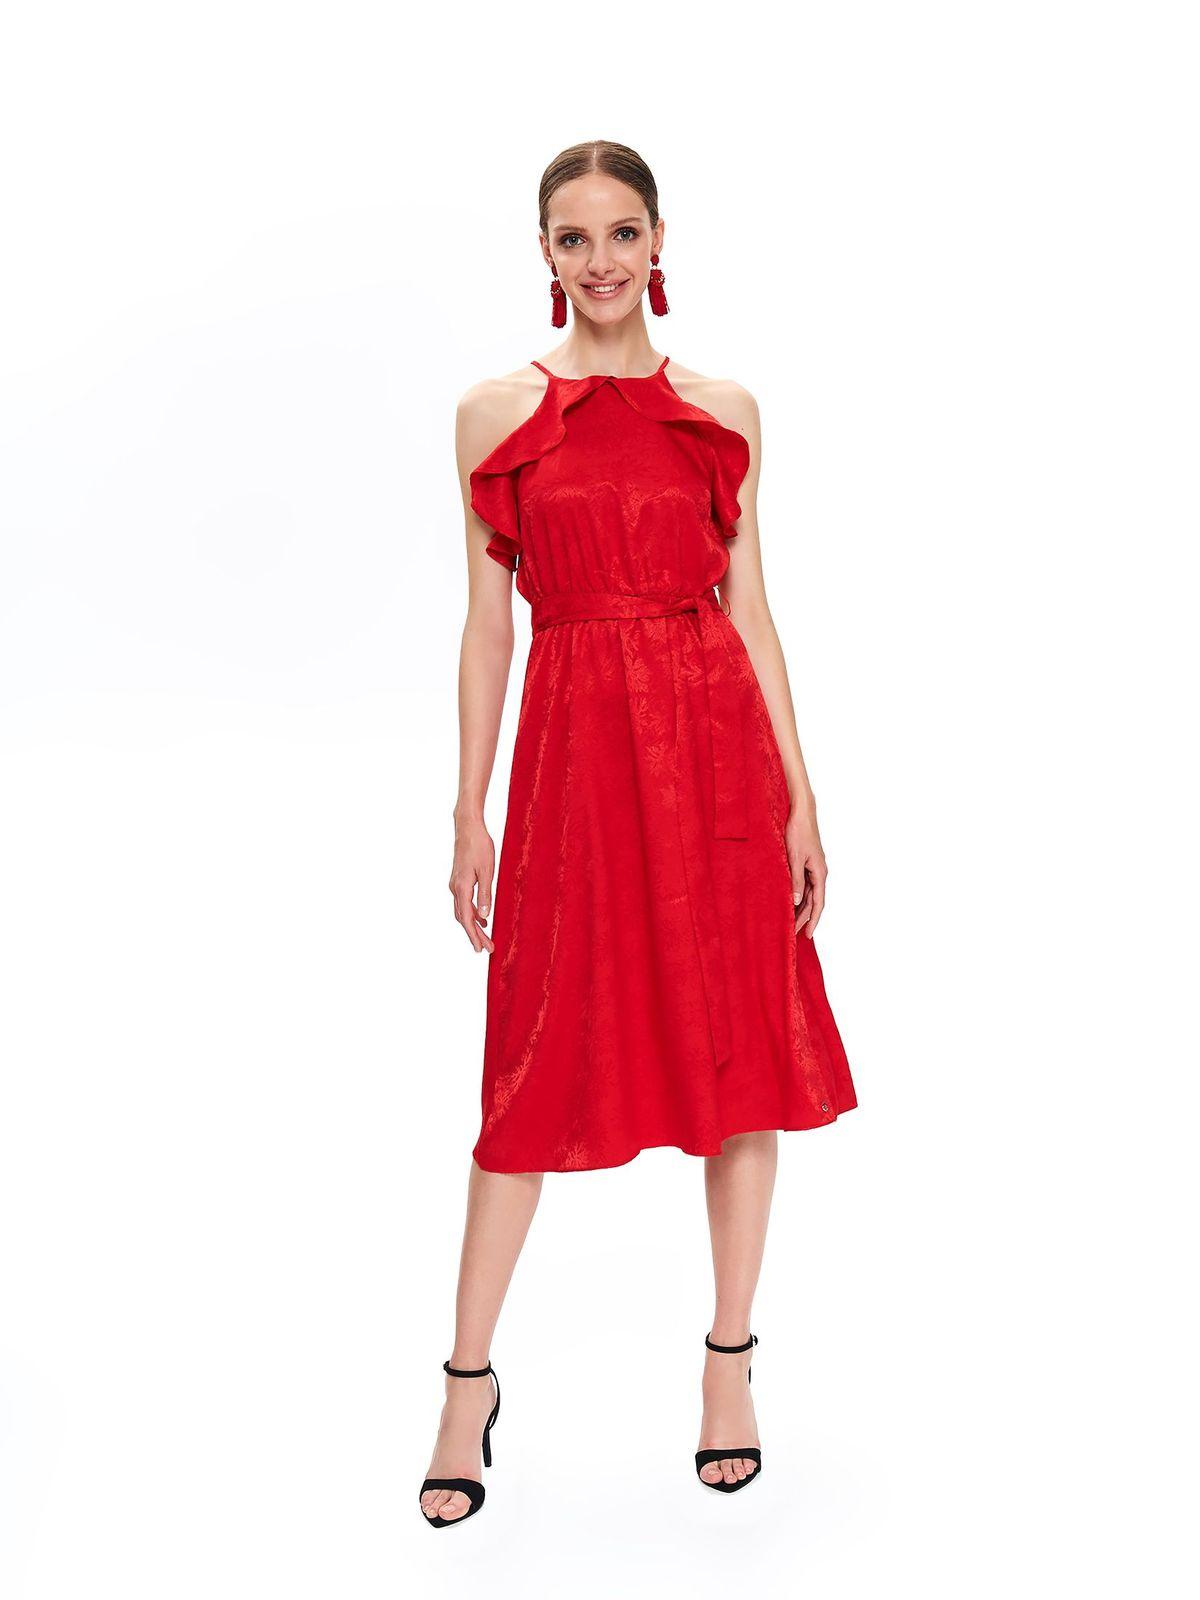 Rochie Top Secret rosie midi in clos din material subtire cu volanase accesorizata cu cordon